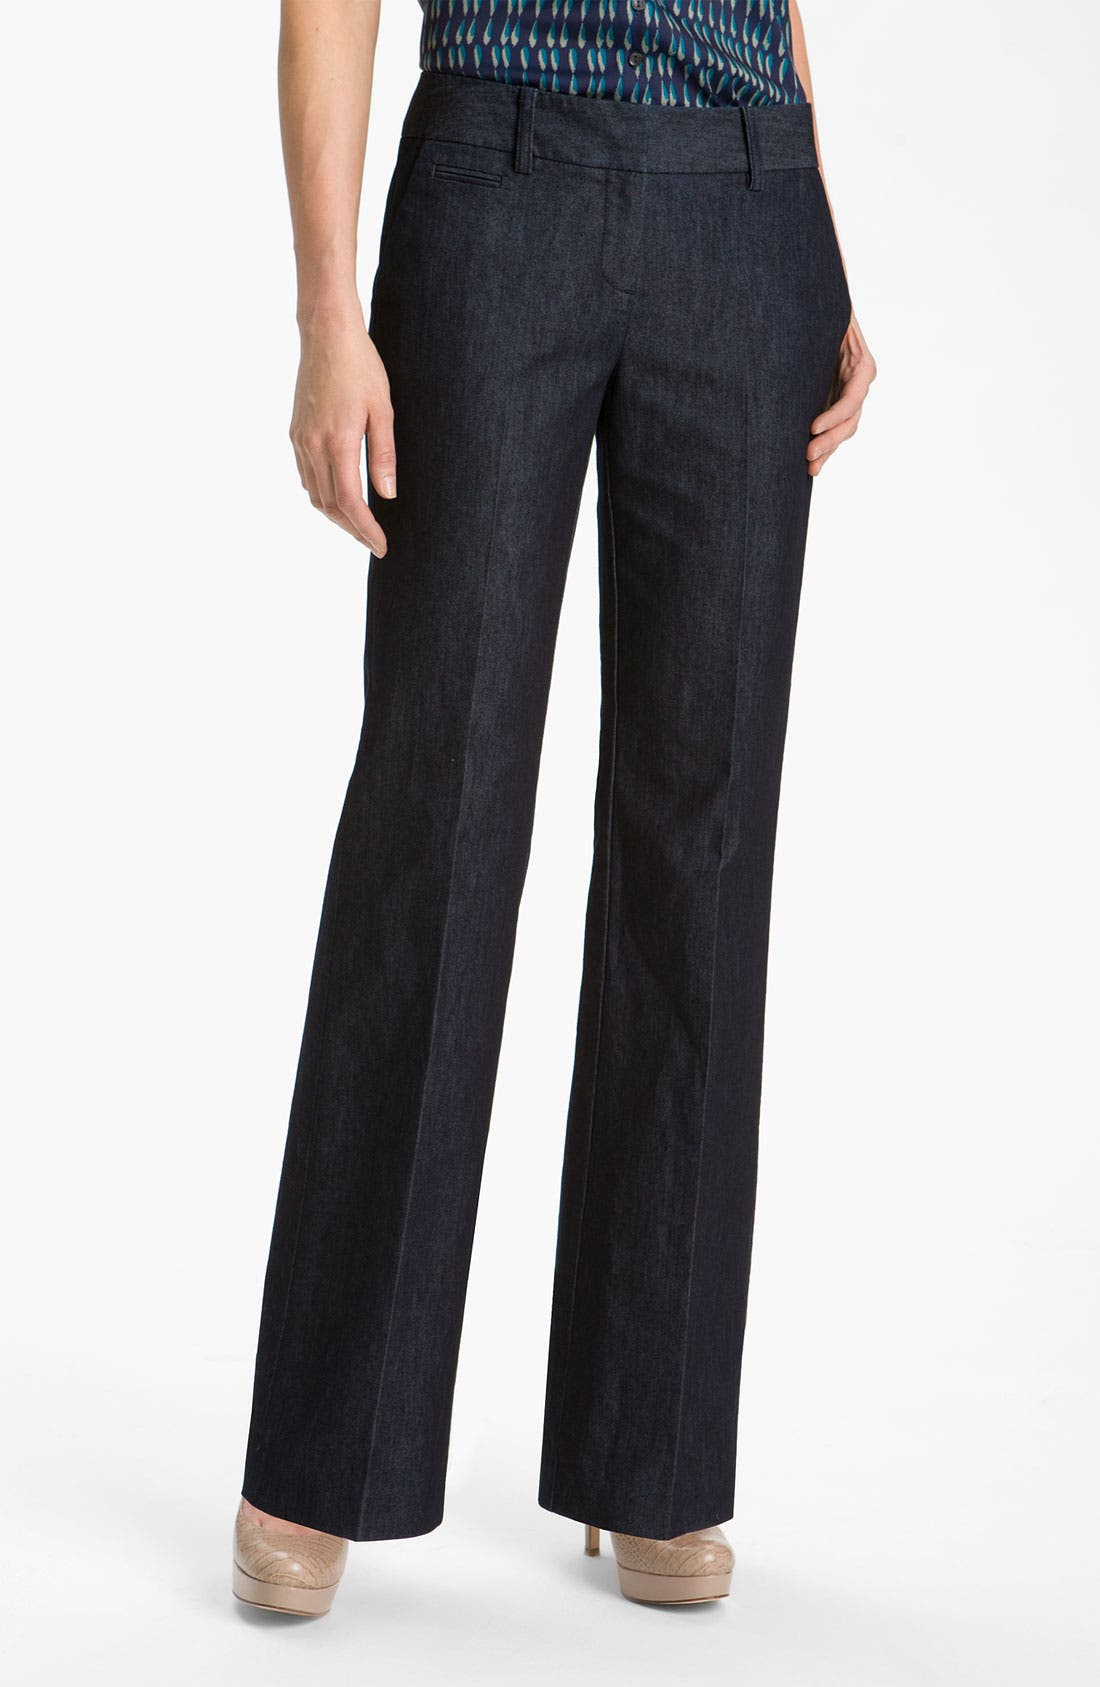 Alternate Image 1 Selected - Halogen® 'Taylor' Curvy Fit Denim Pants